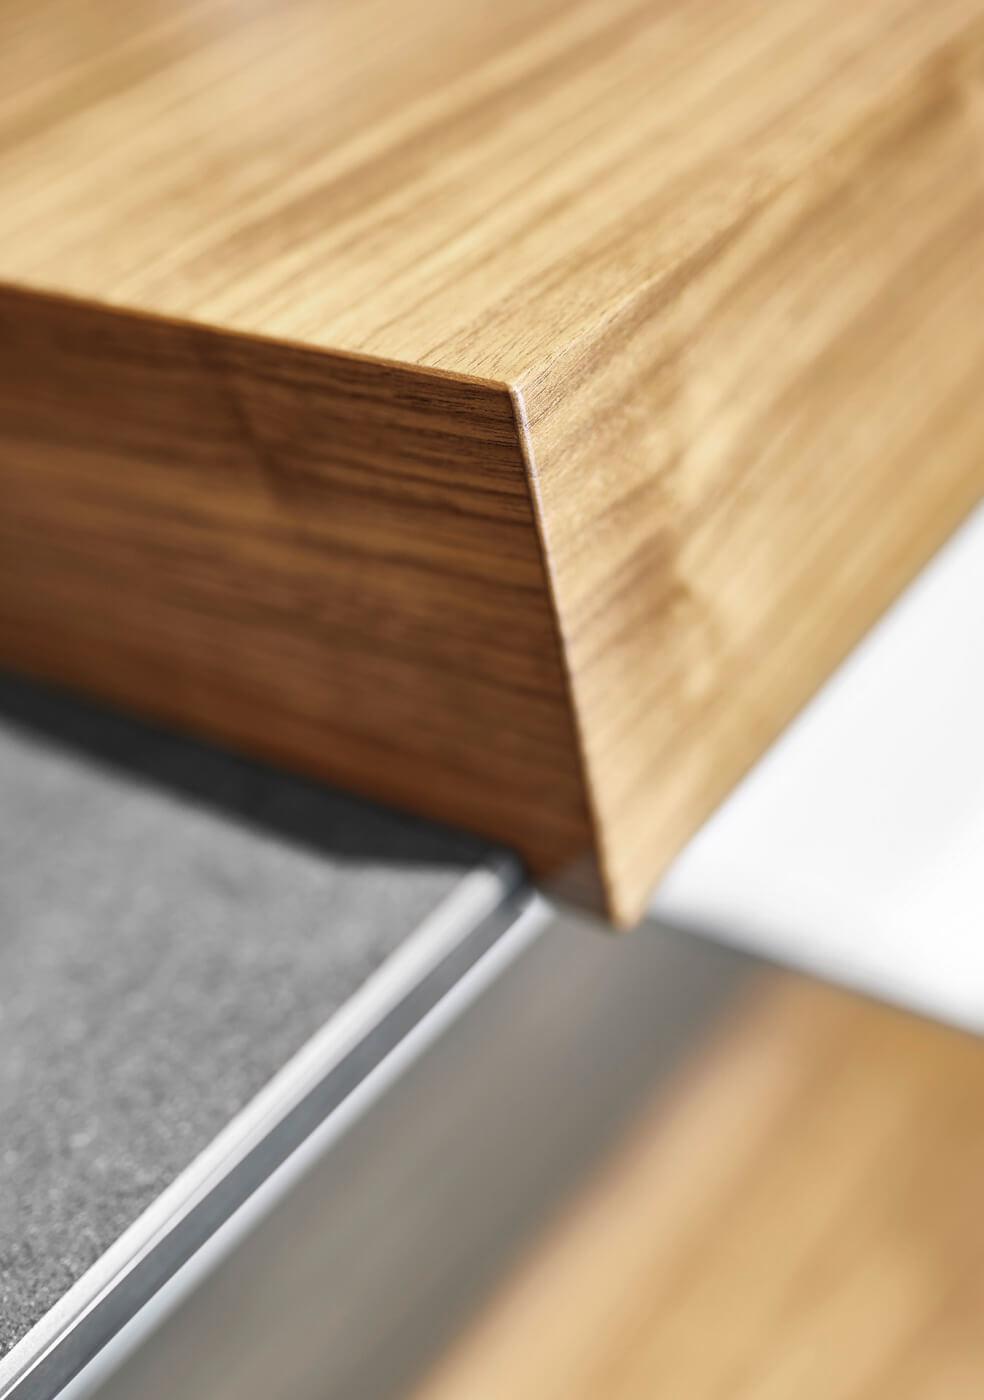 ligna glas, Glasfront mit Holzelementen